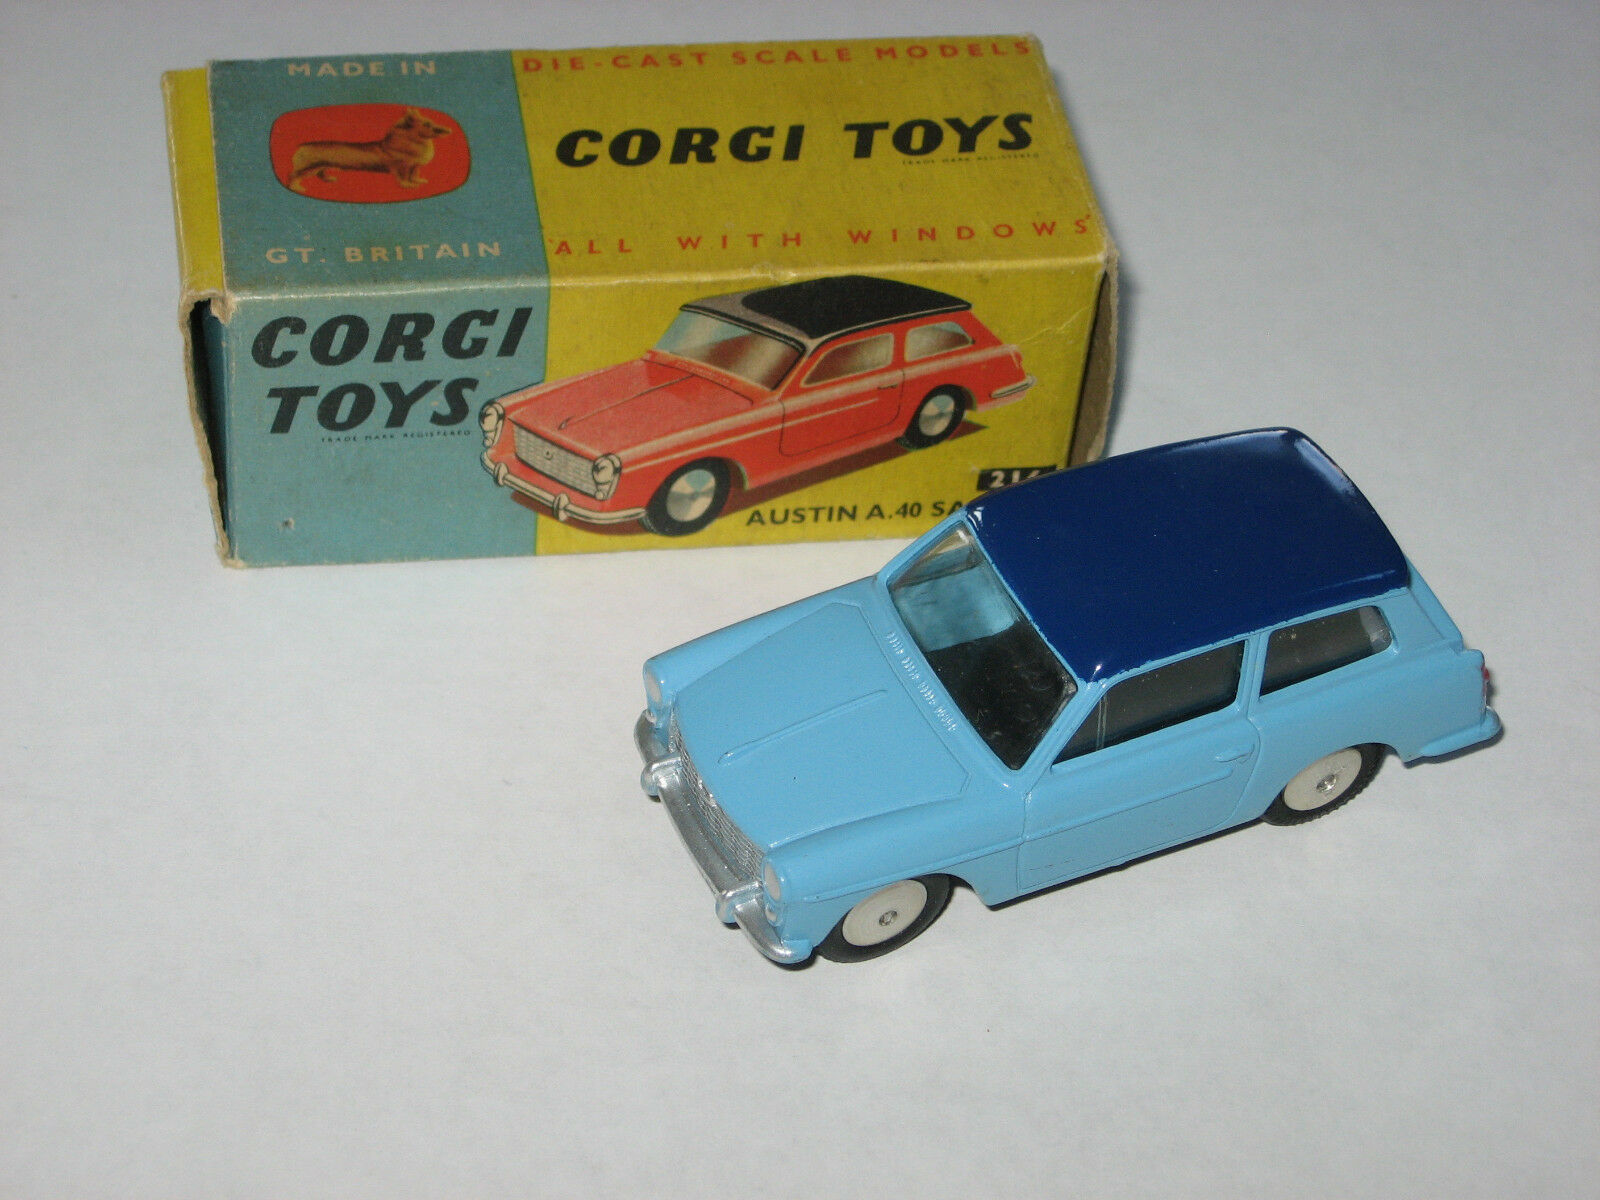 CORGI TOYS  no 216 Austin A.40 Saloon near Comme neuf in original box  les ventes chaudes